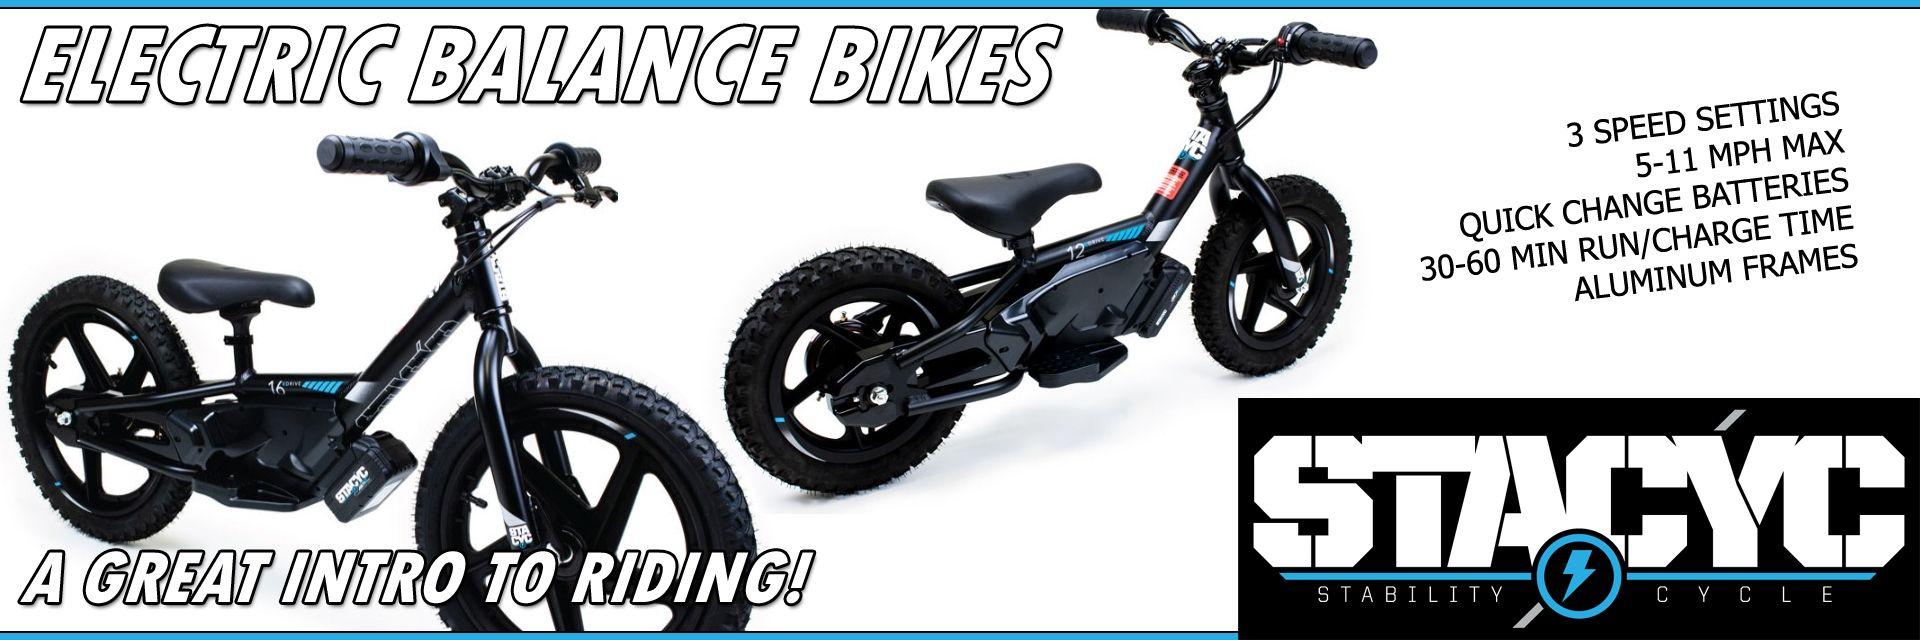 STACYC electric balance bikes